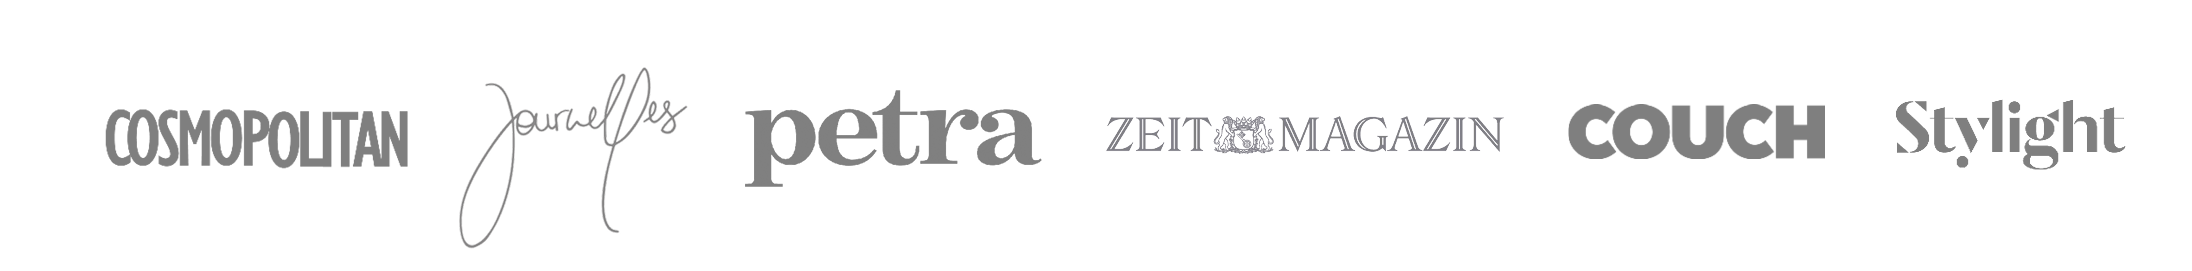 Presse Banner - Cosmopolitan_Journelles_petra_zeit magazin_couch_stylight